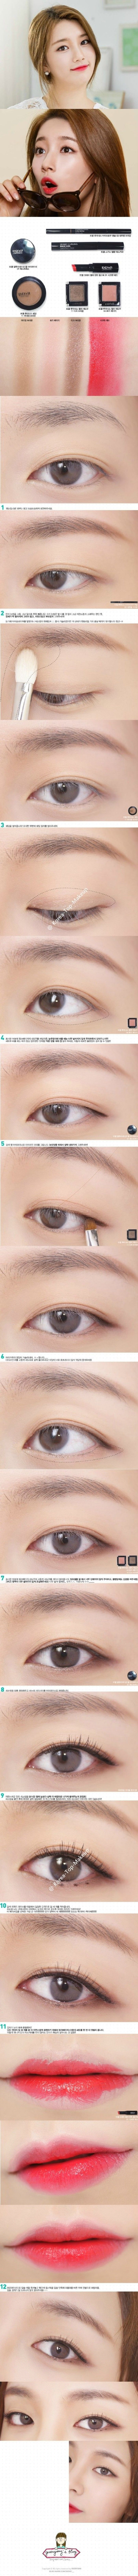 suzy eye make up